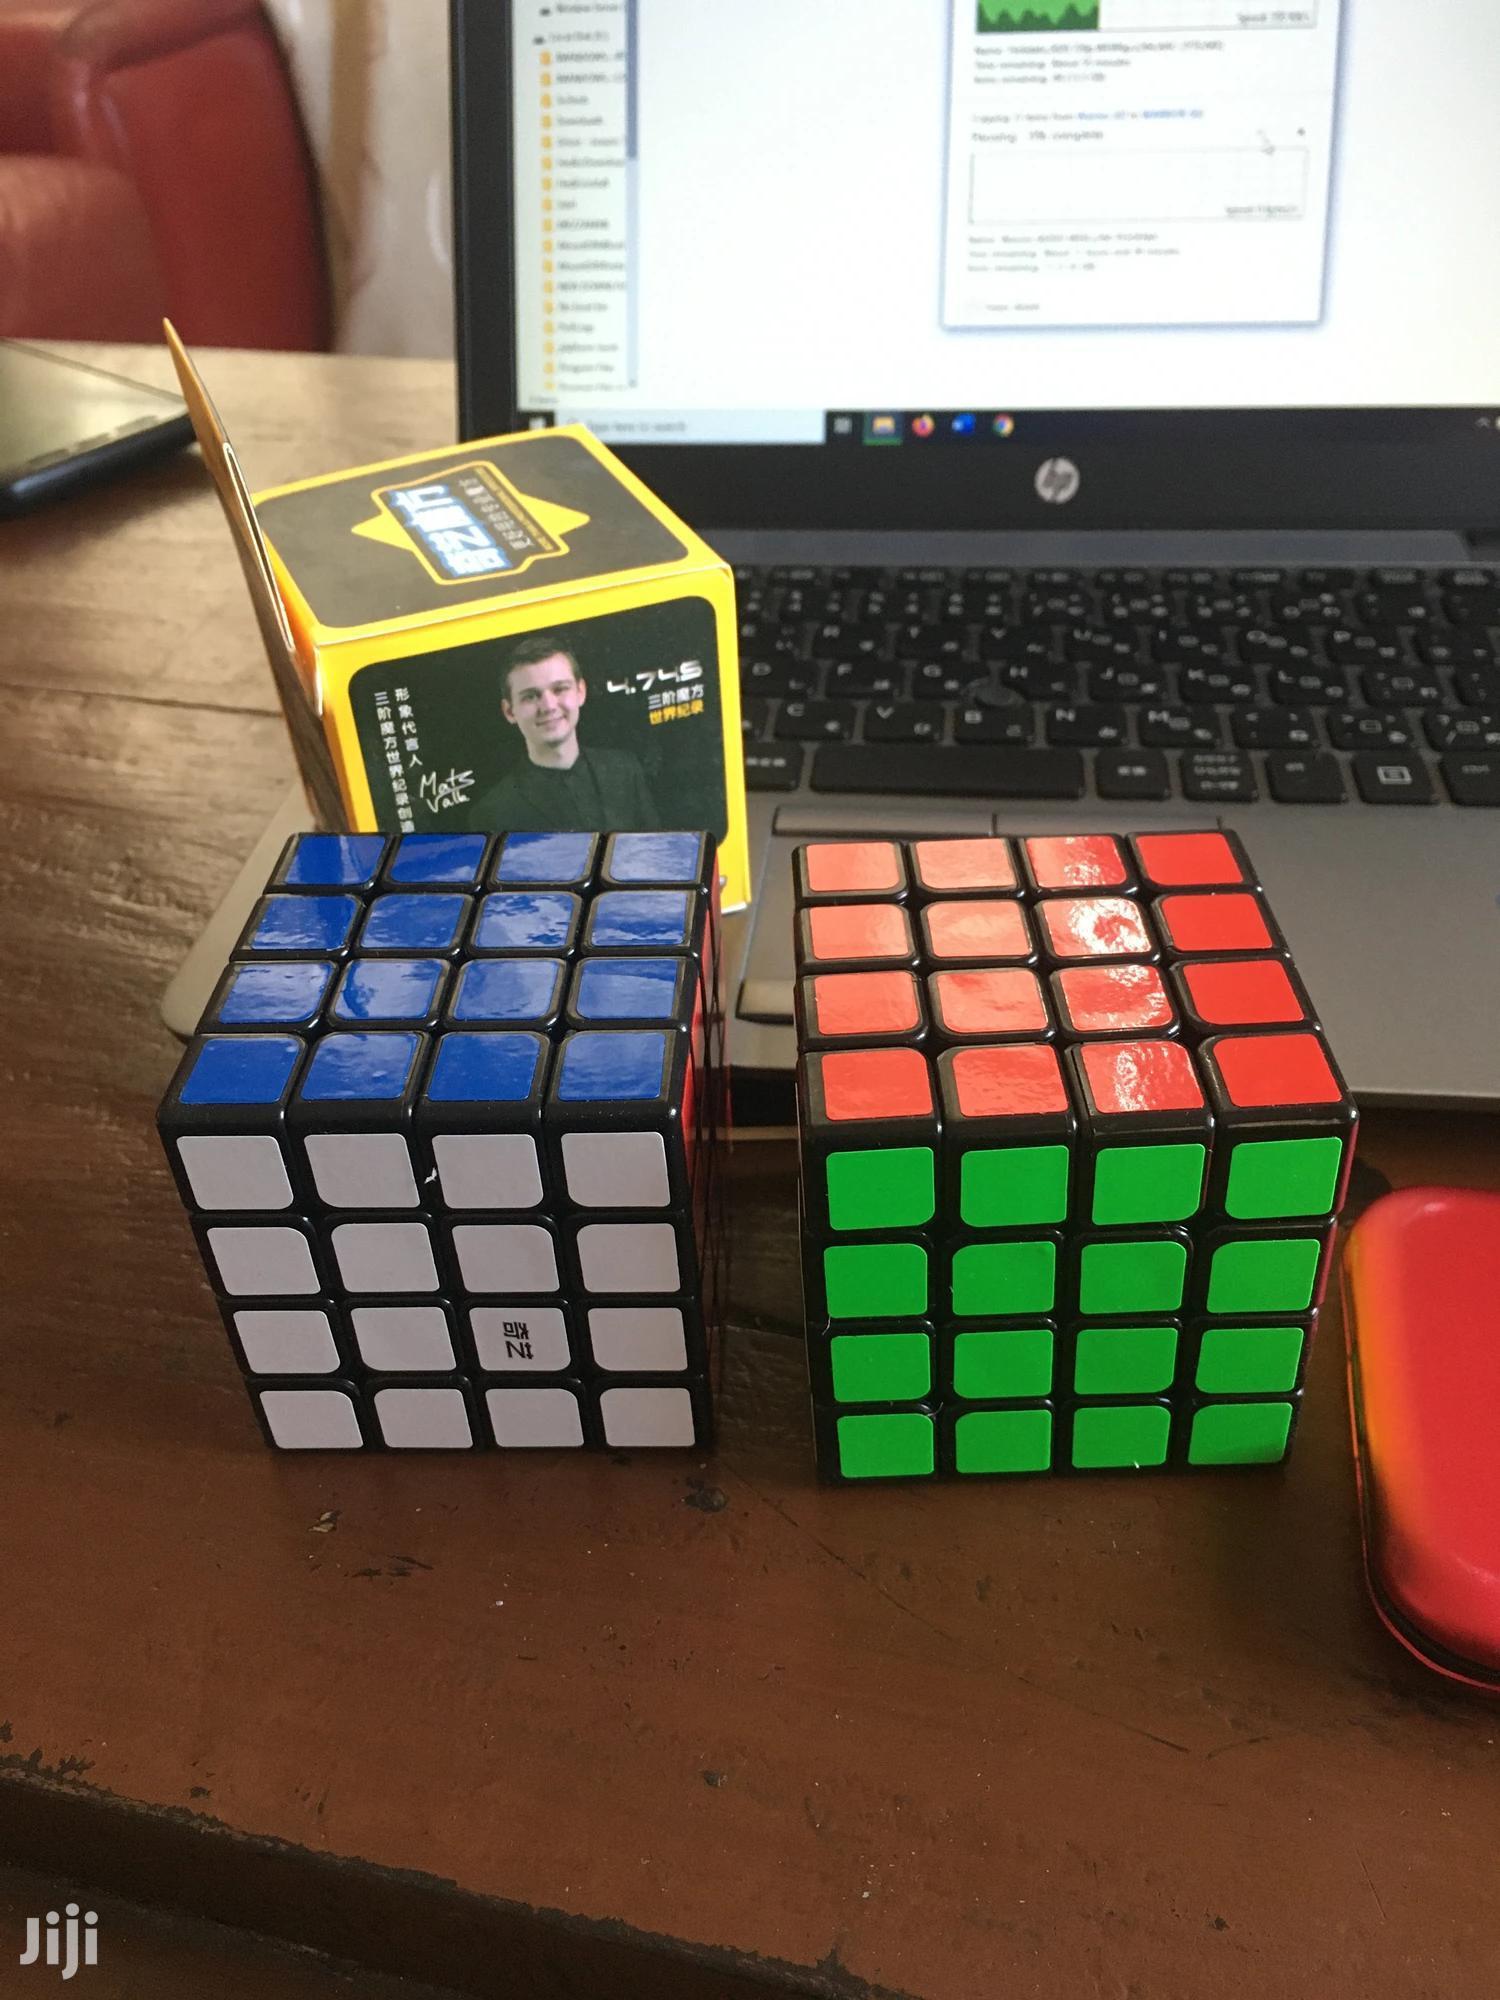 Rubik'S Cube 4x4x4 | Books & Games for sale in Kinondoni, Dar es Salaam, Tanzania